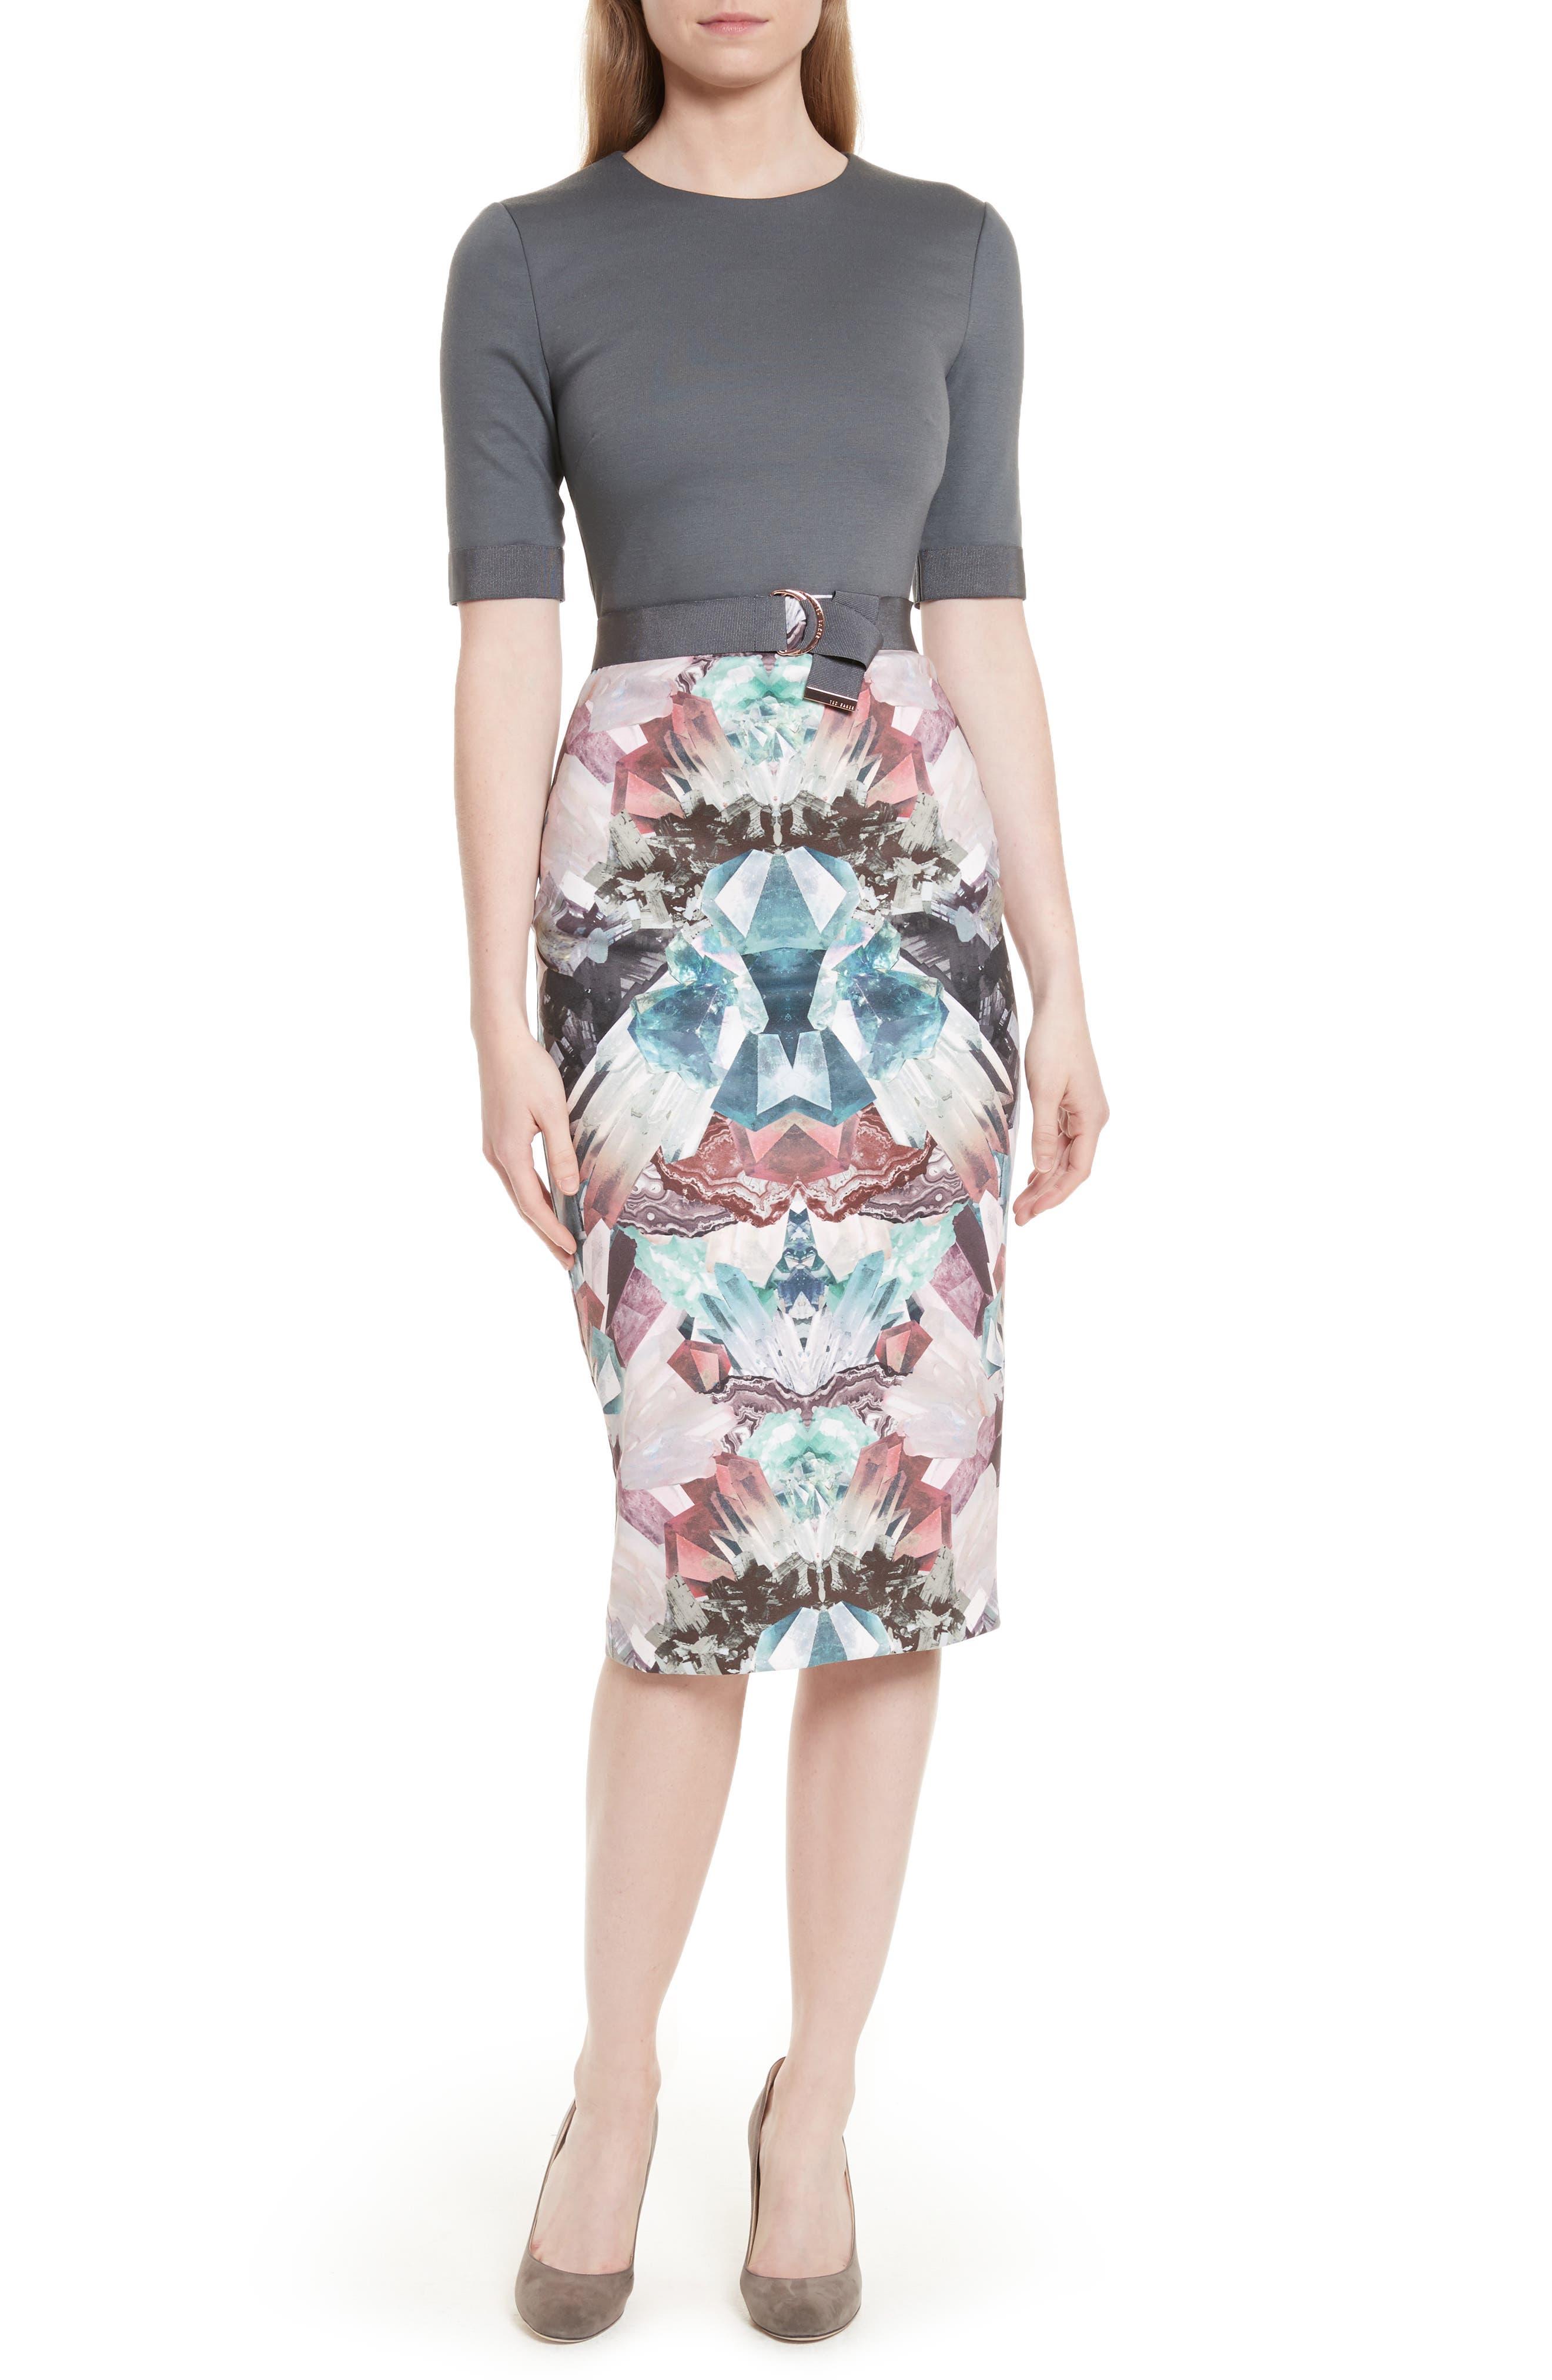 Ted Baker London Anaste Mirror Minerals Print Dress